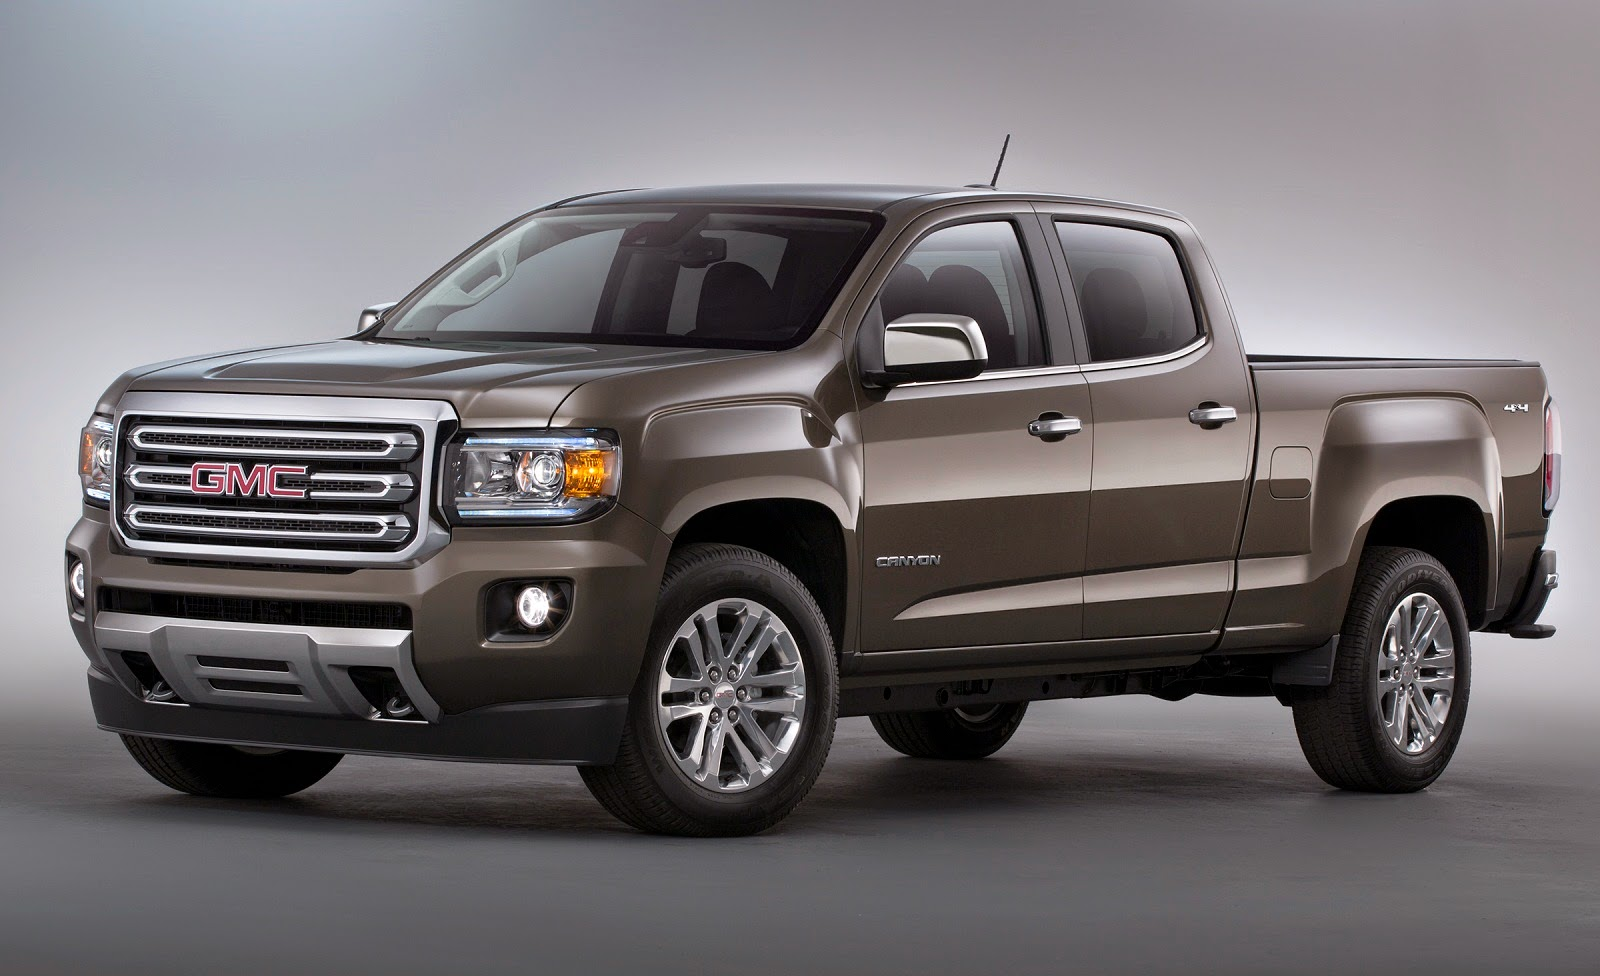 2015 GMC Canyon Elevates Midsize Truck Segment | Car ...